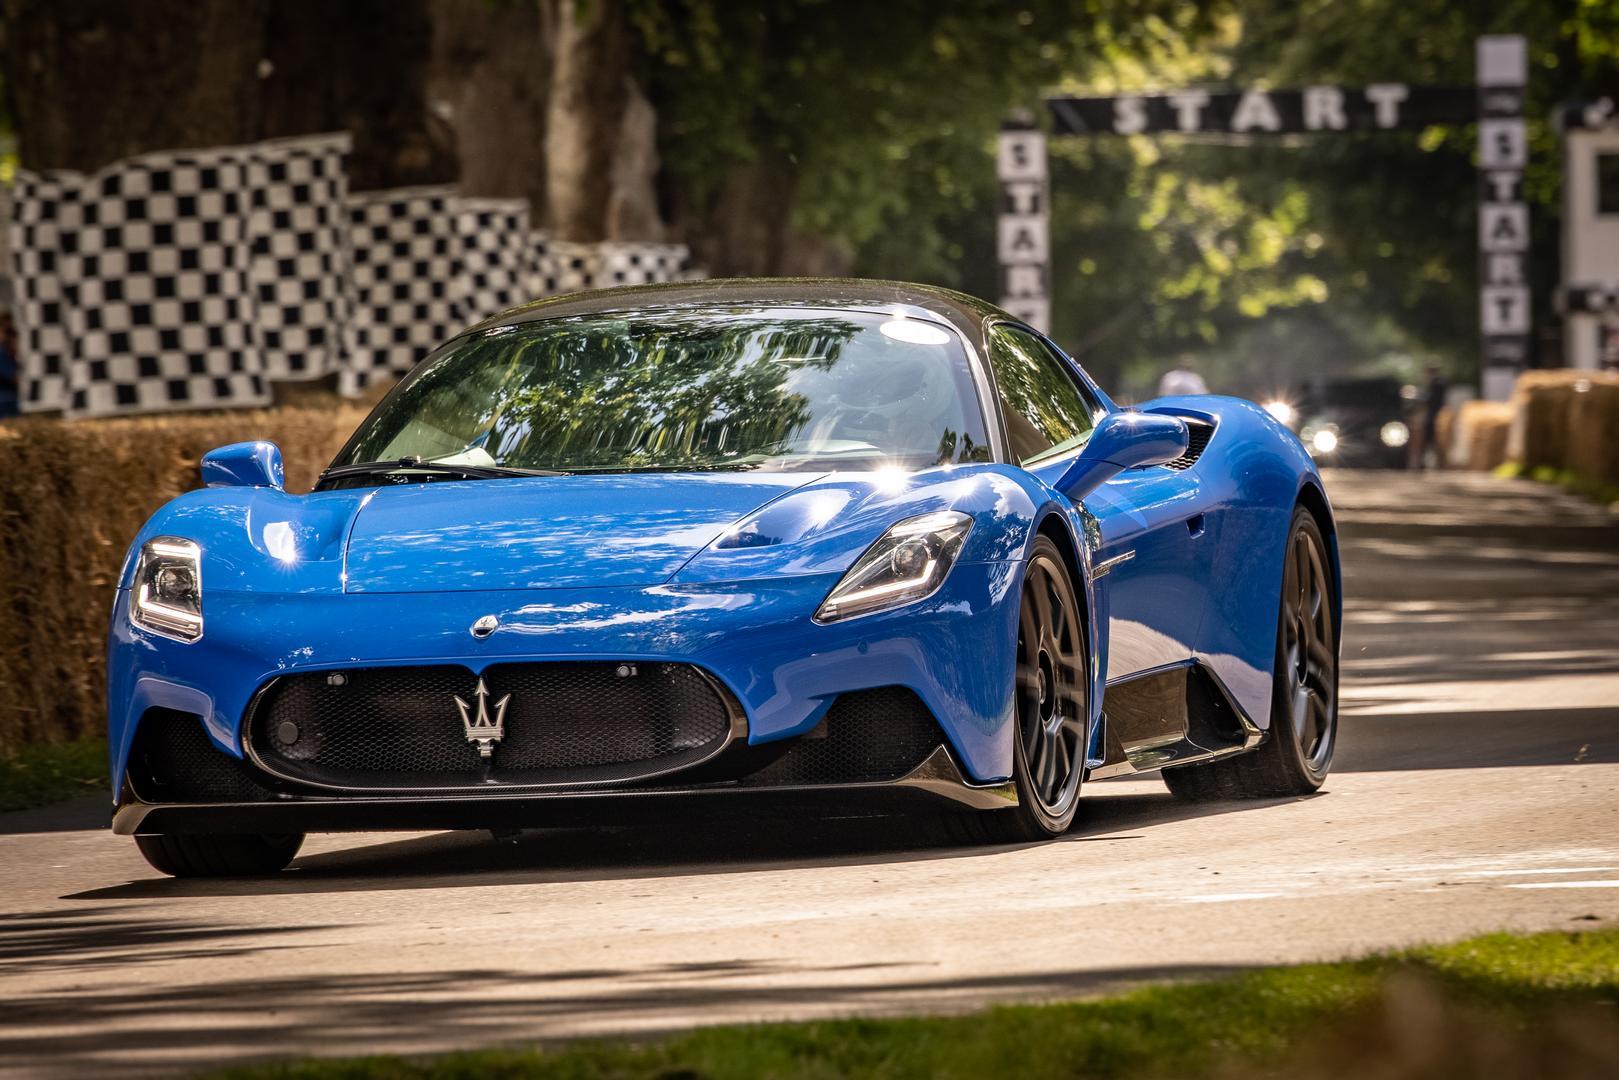 2022 Maserati MC20 price